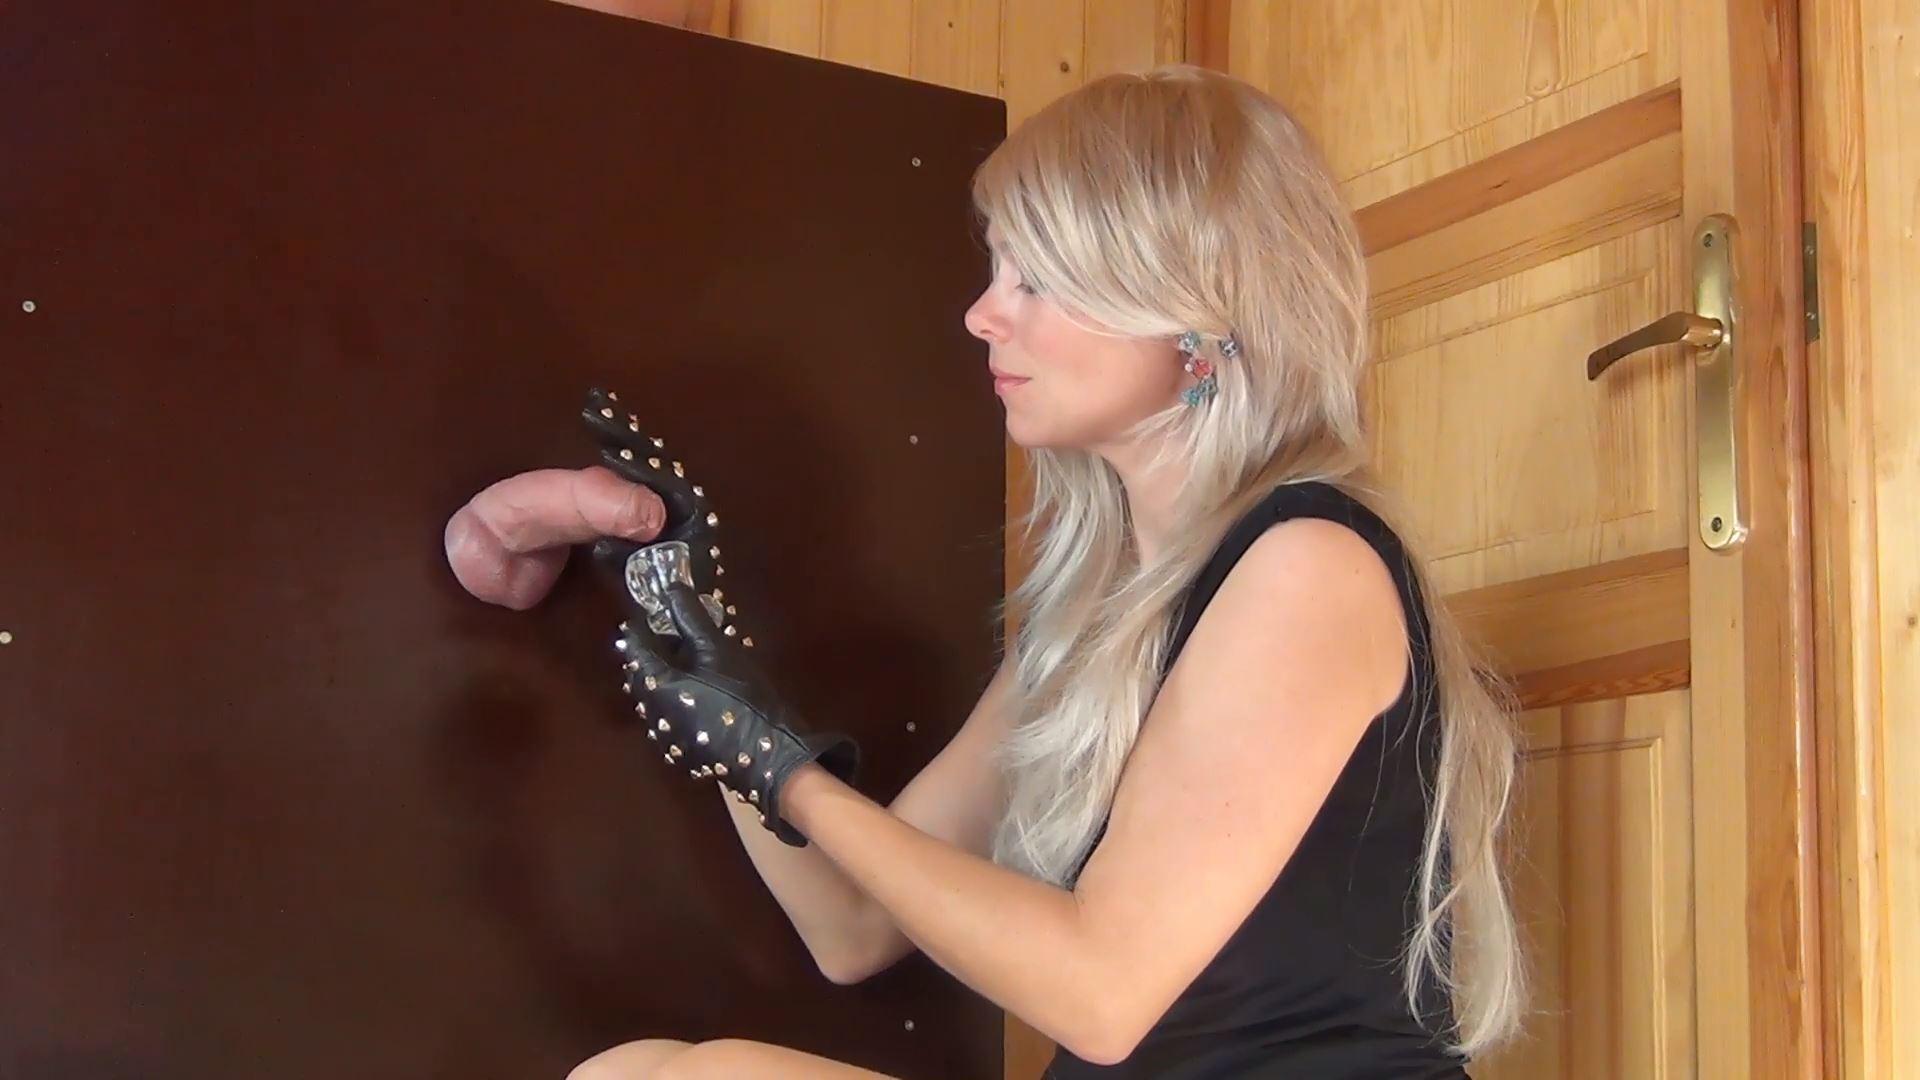 Mistress Alina In Scene: Alina In Cum Drinking - CBTRAMPLE - FULL HD/1080p/MP4